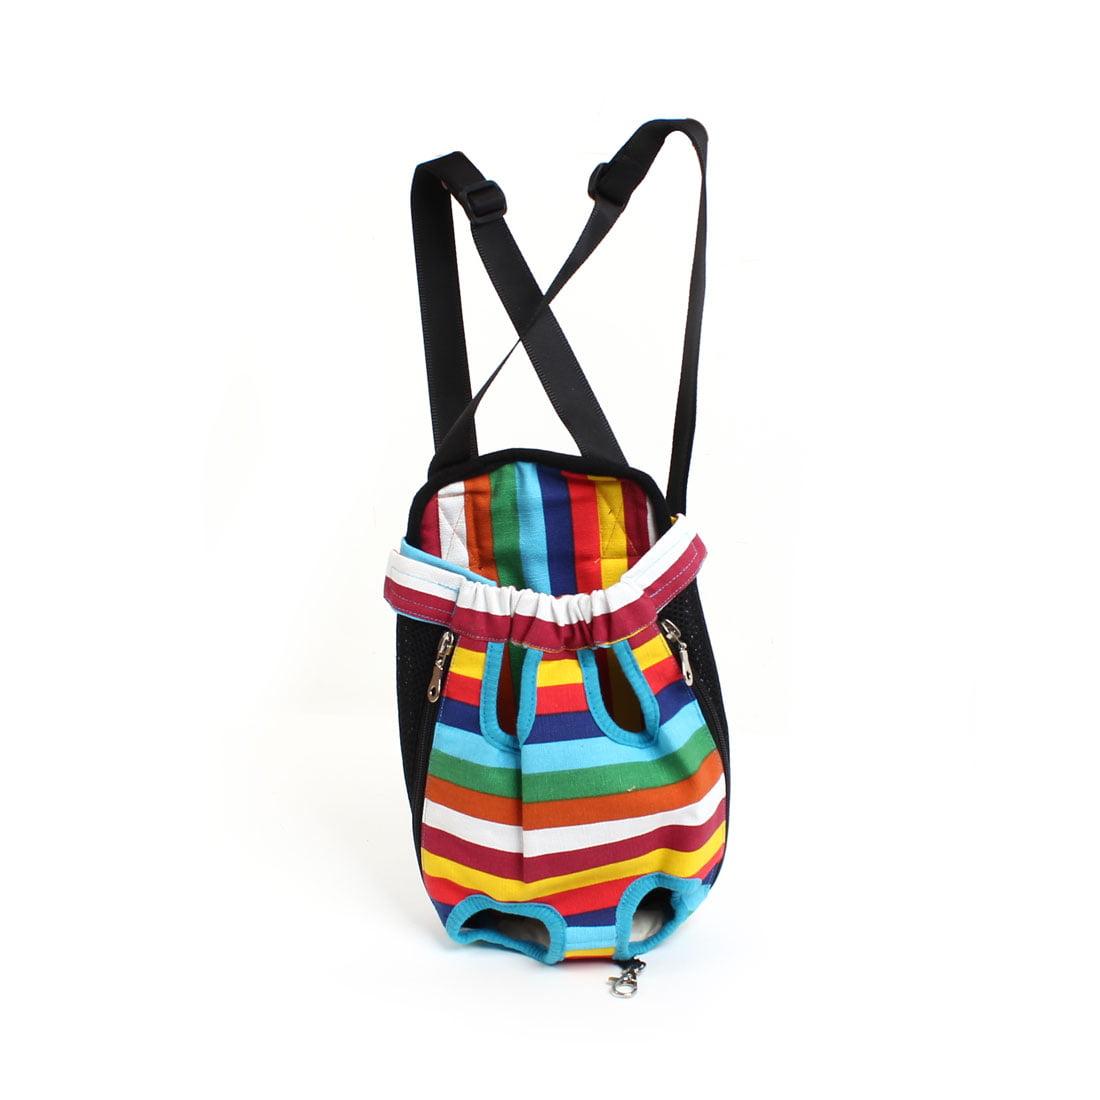 Assorted Color Adjustable Strap Release Buckle Pet Dog Outdoor Carry Bag M